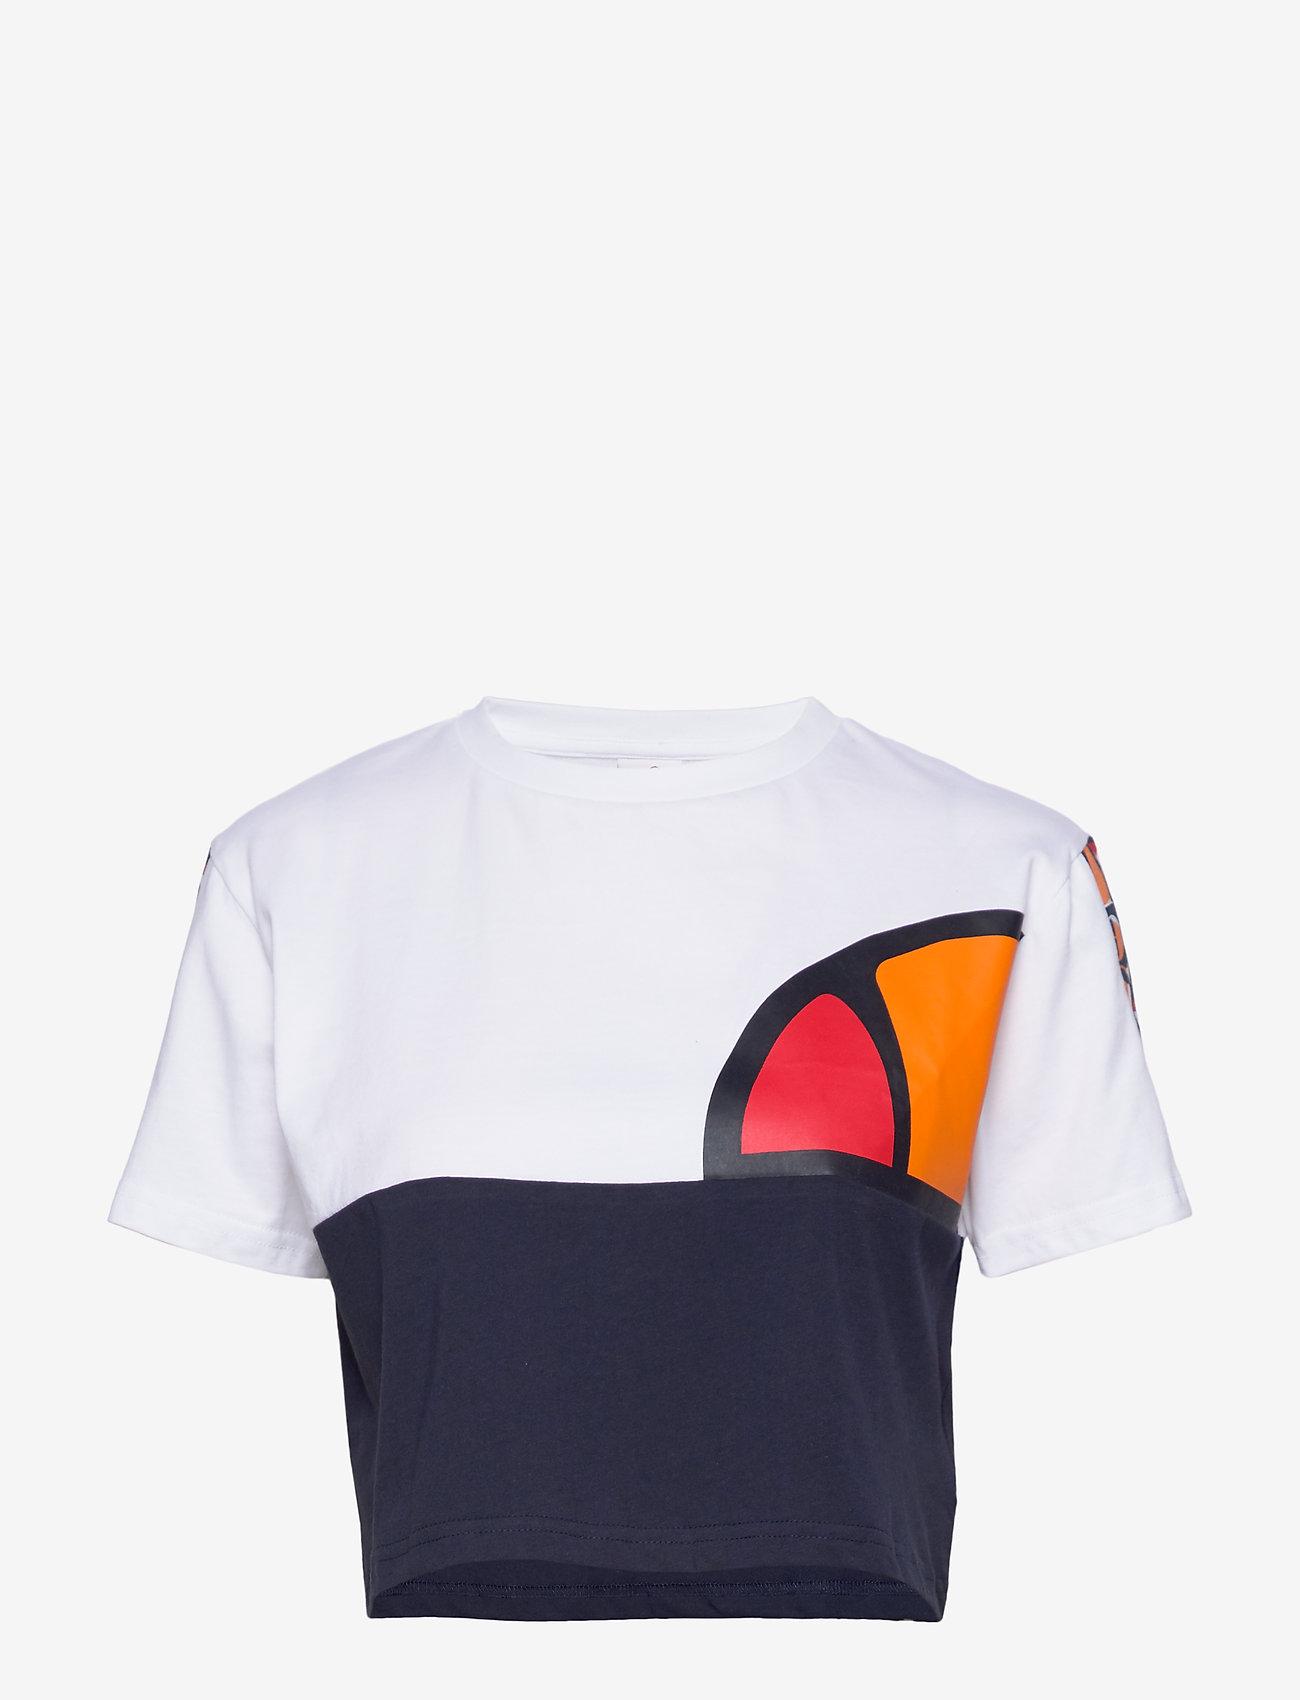 El Anat Crop T-shirt (White) (200 kr) - Ellesse